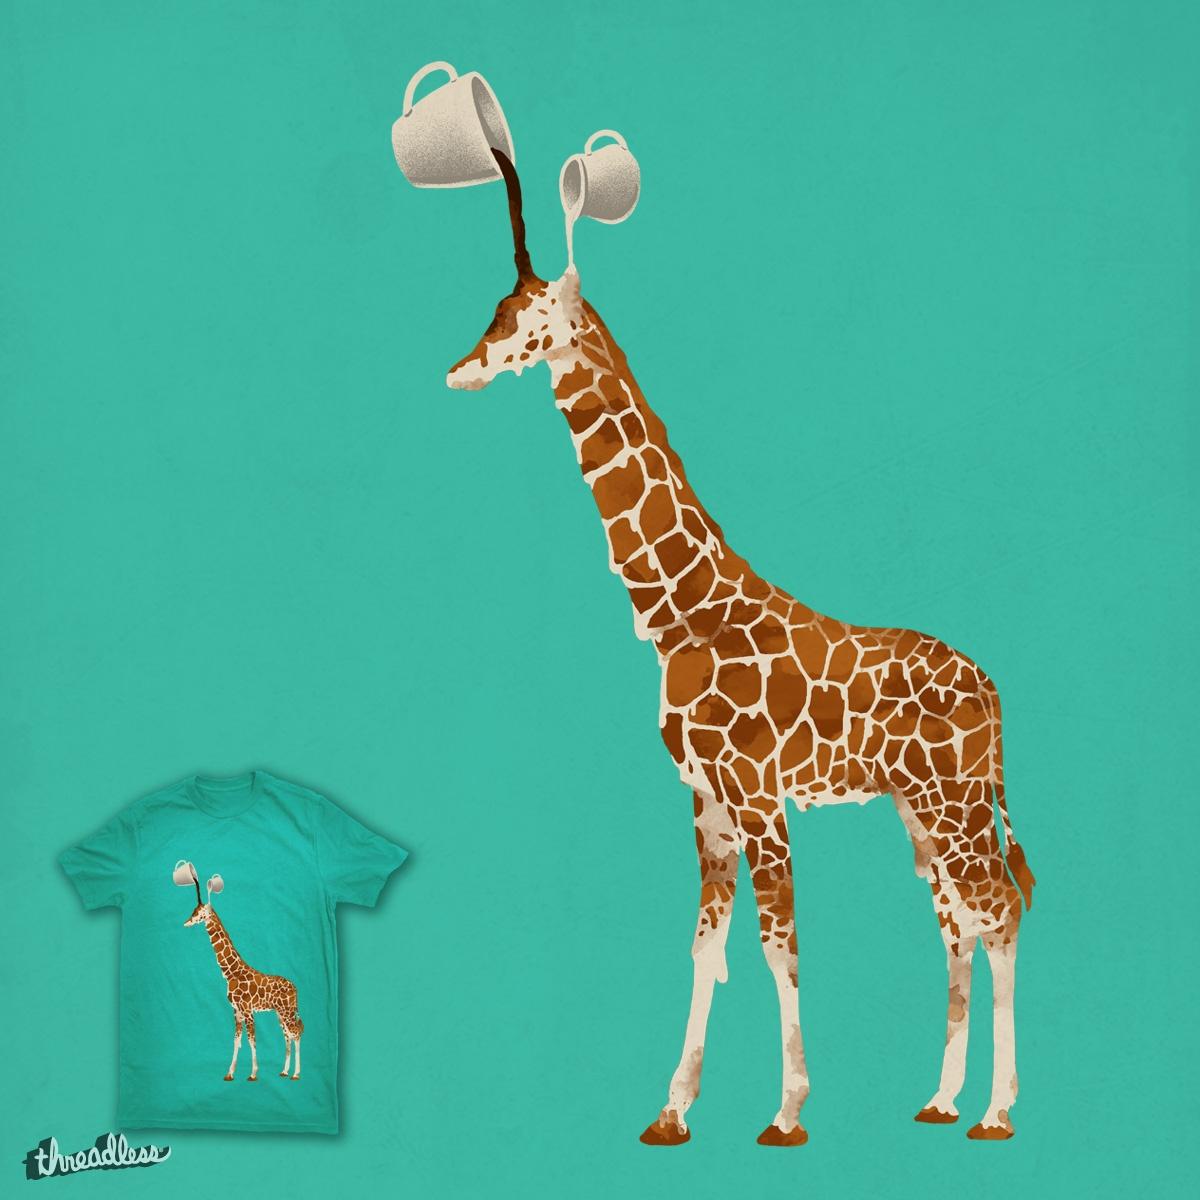 Coffee Giraffe by ben chen on Threadless